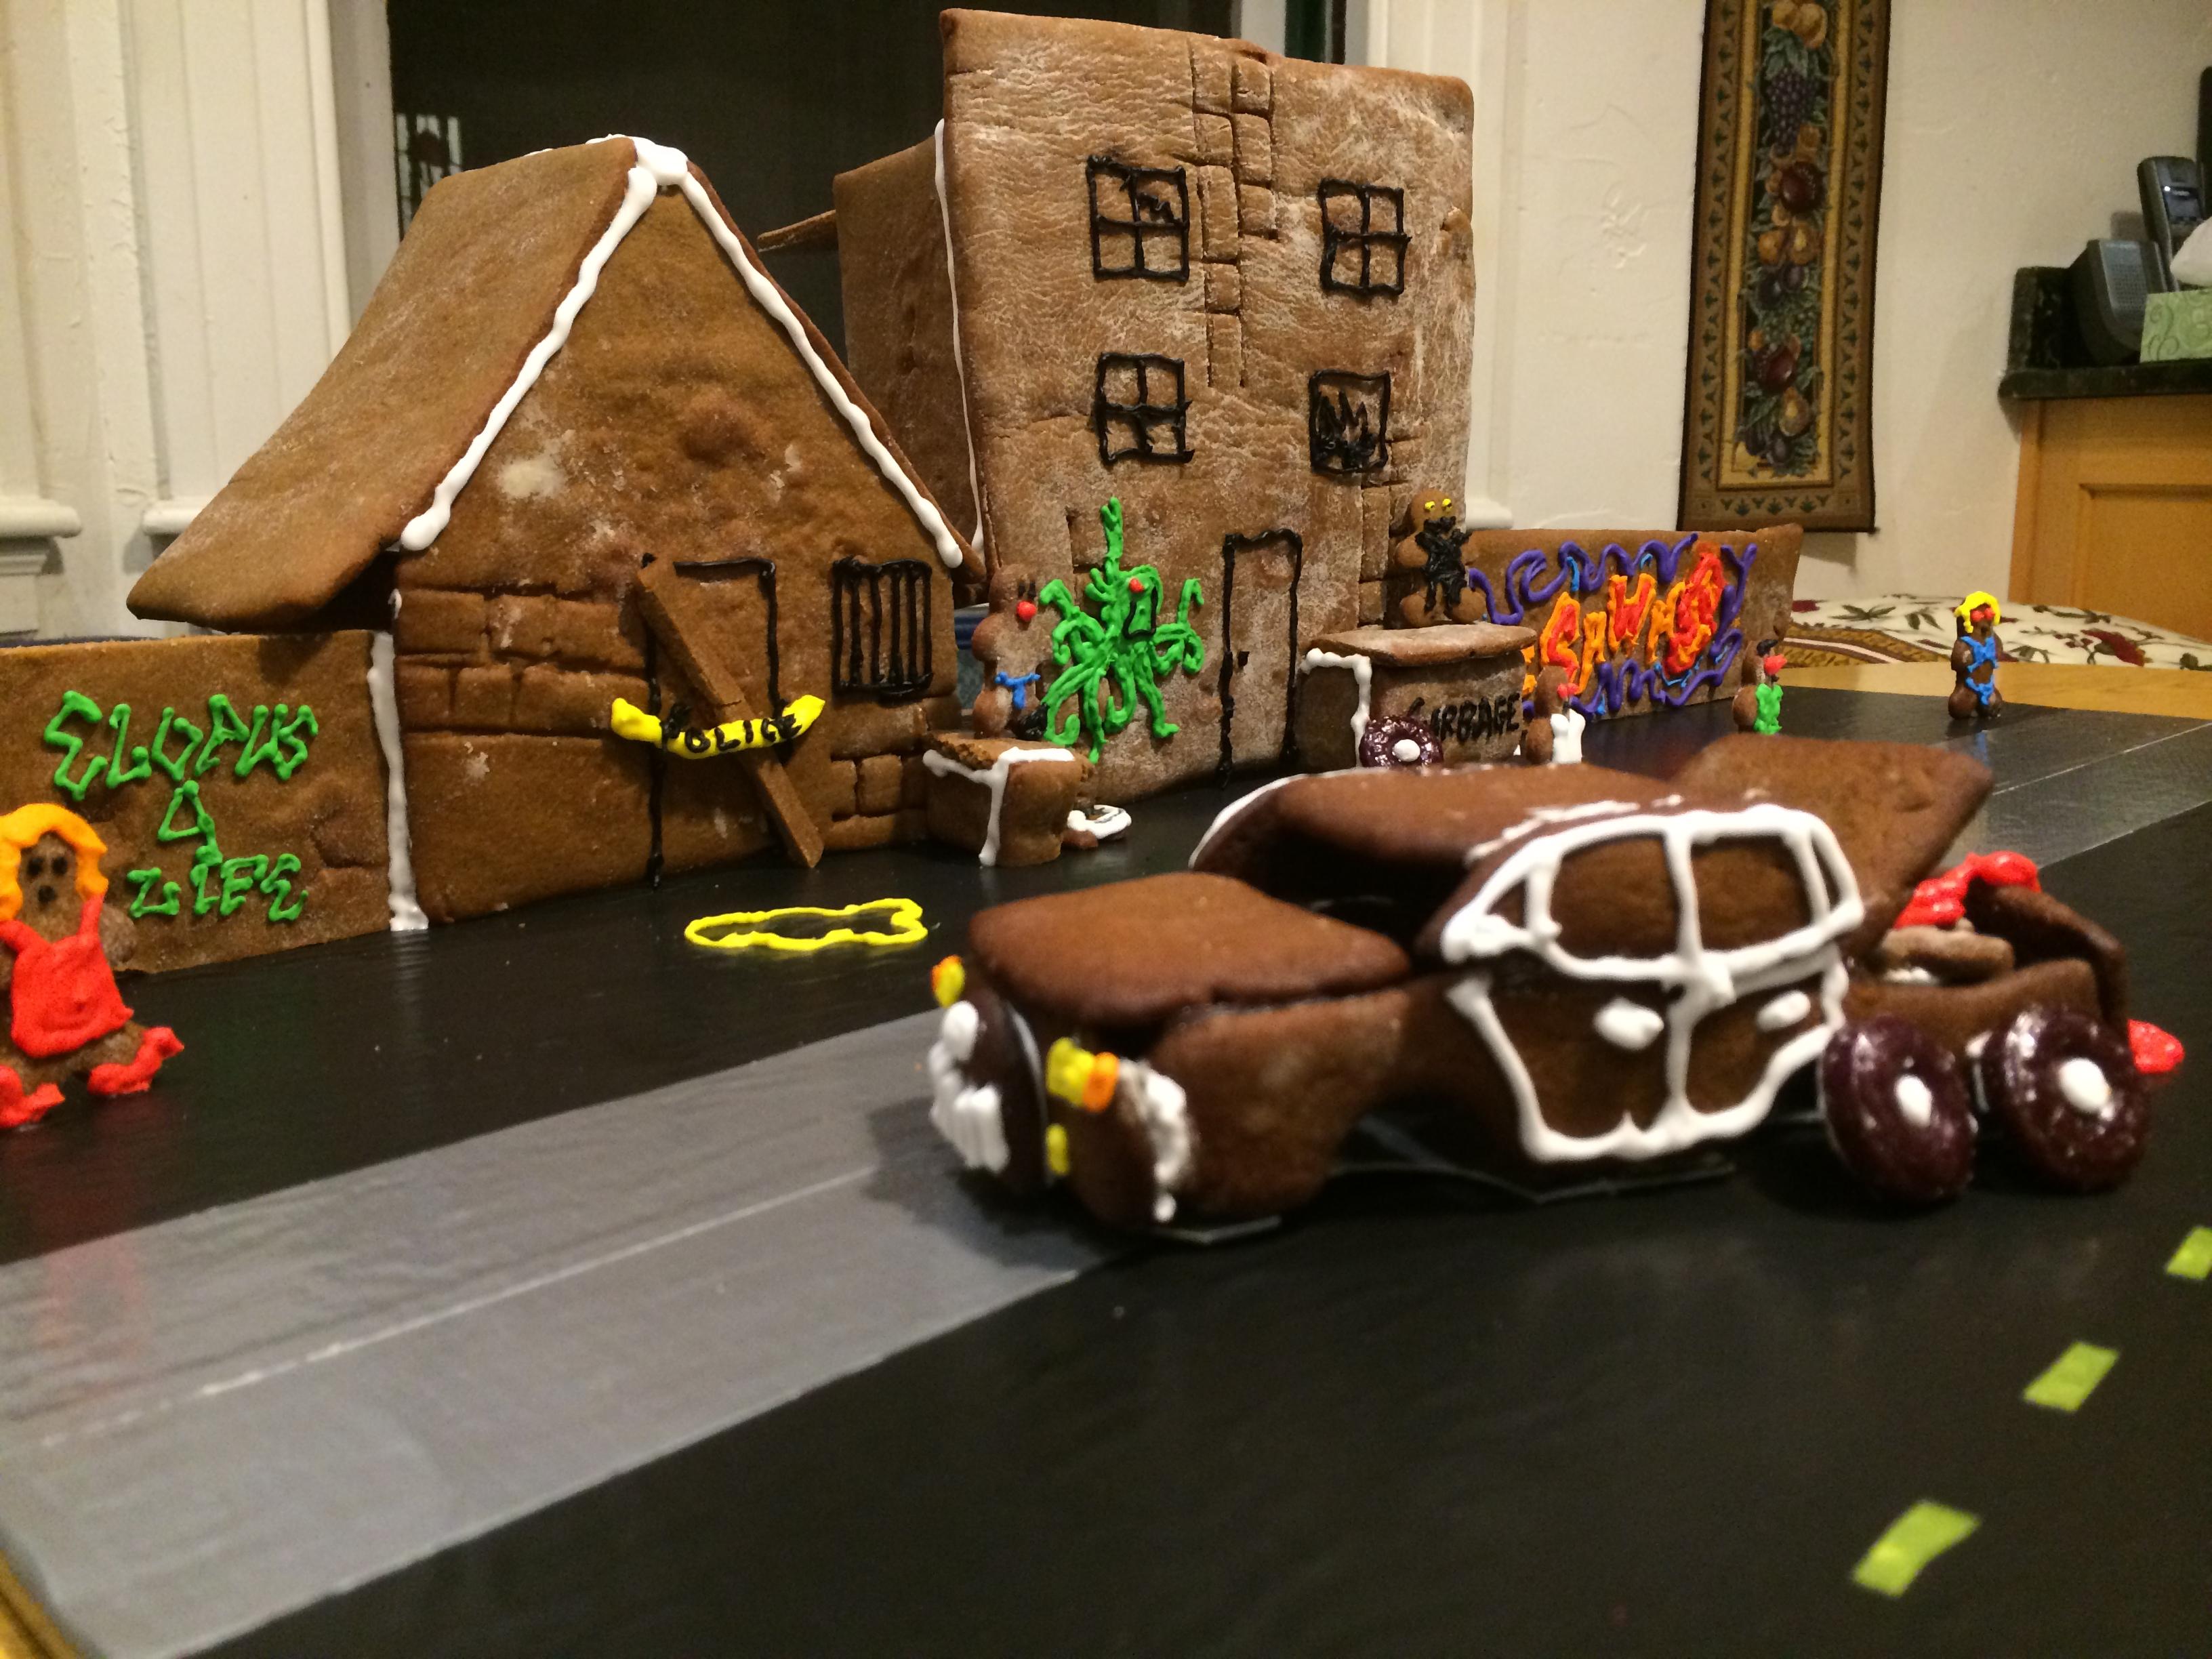 Item 90 - Gingerbread Urban Blight